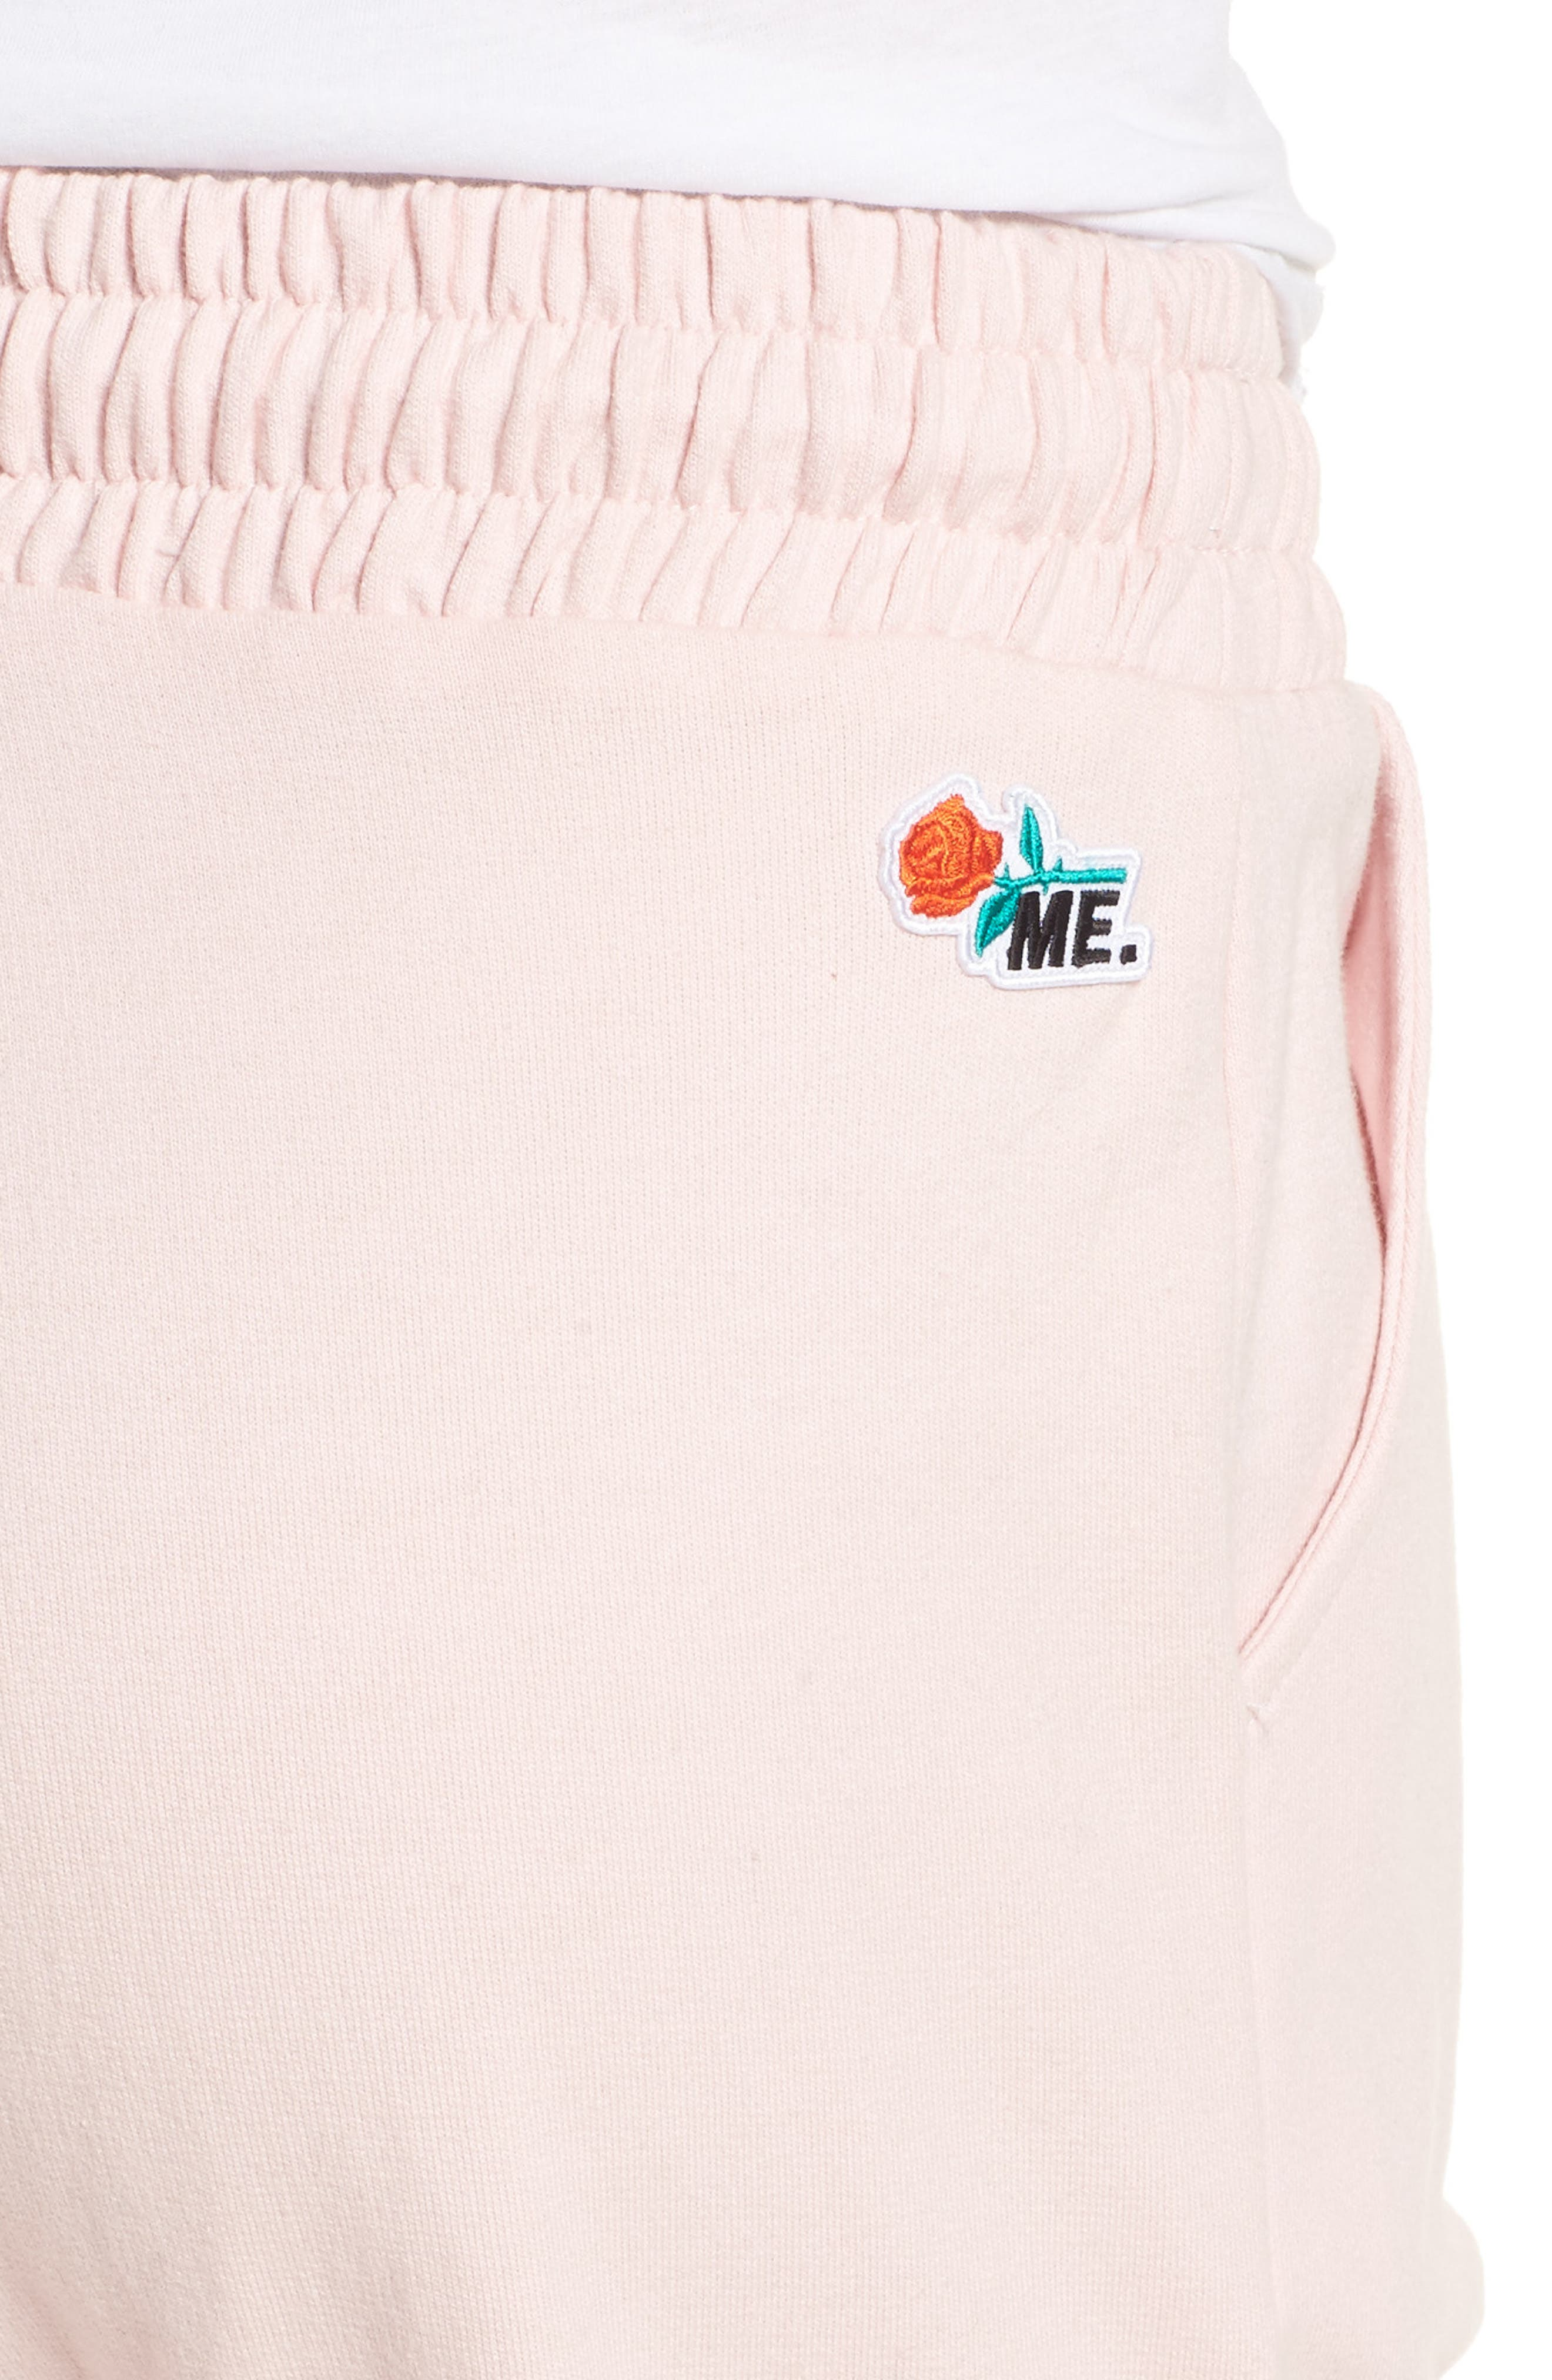 ME Sweatpants,                             Alternate thumbnail 4, color,                             650